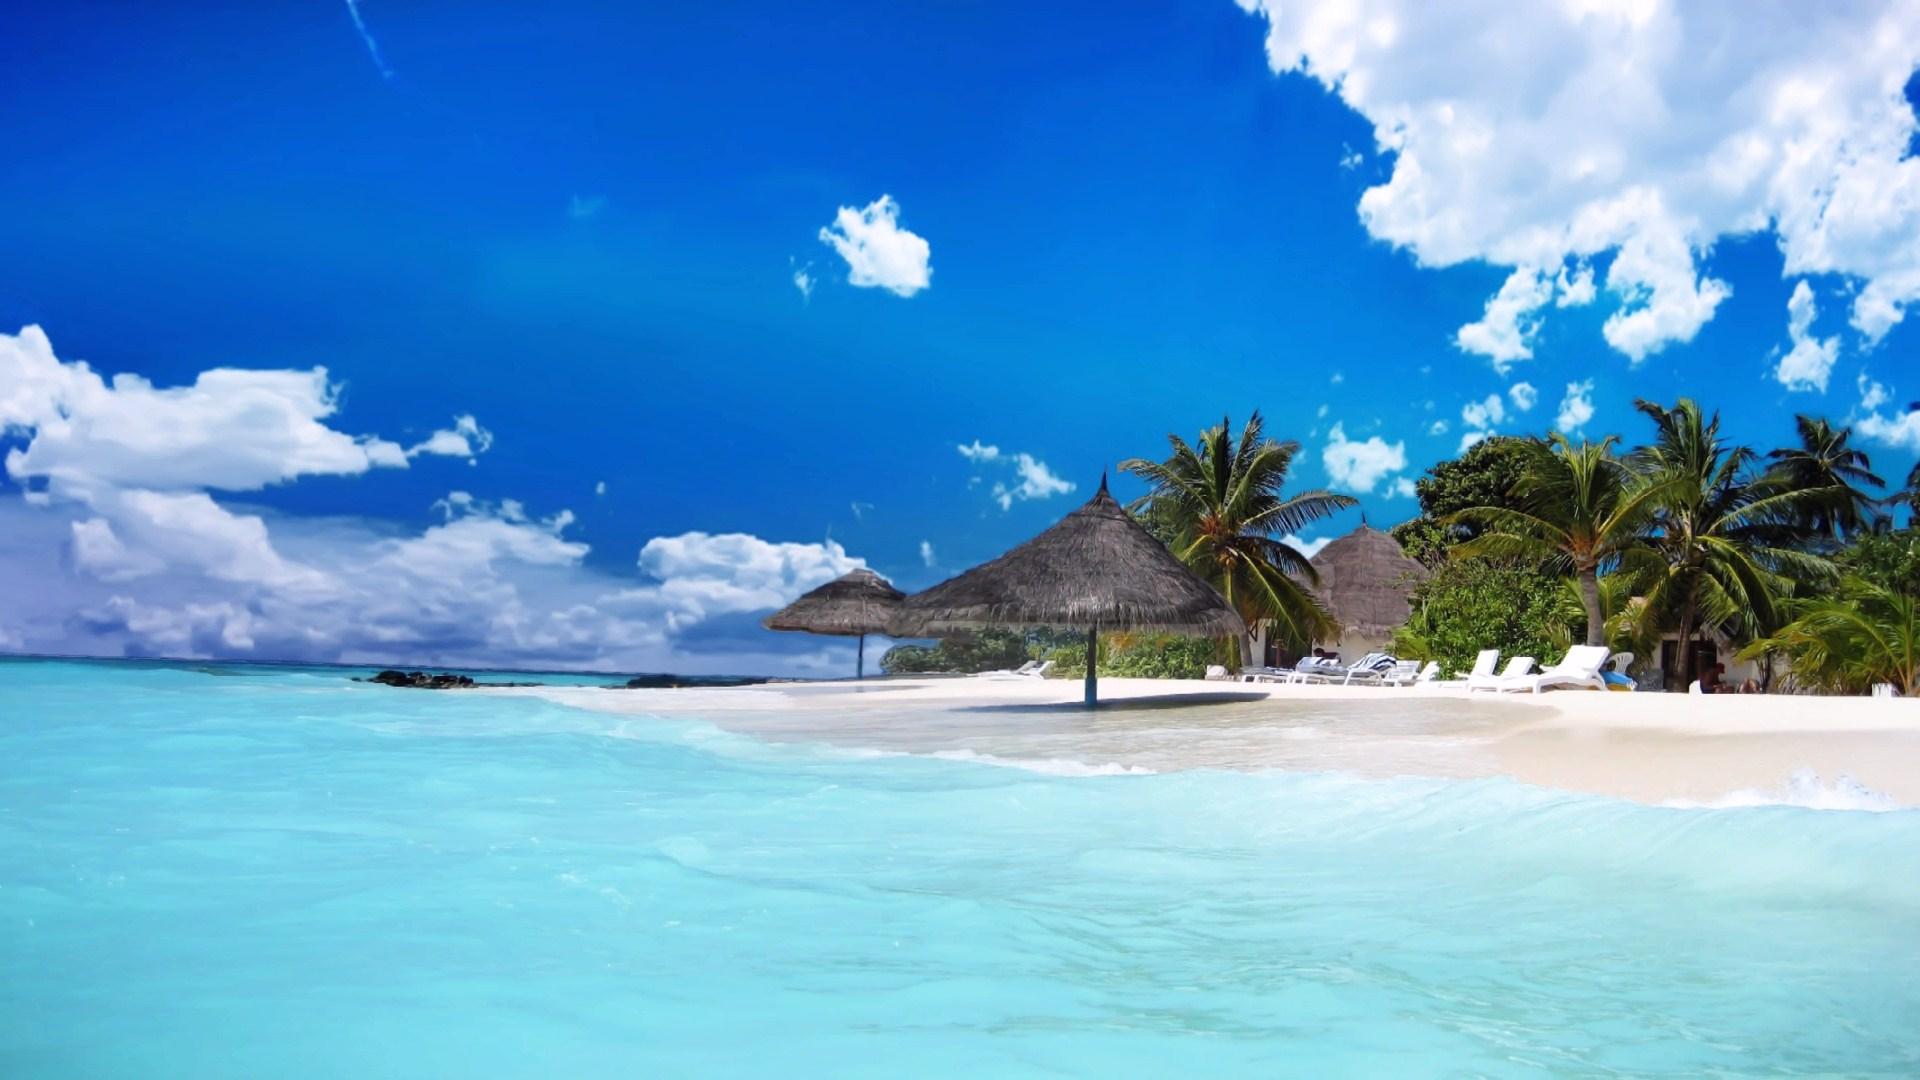 Hd фото с пляжа